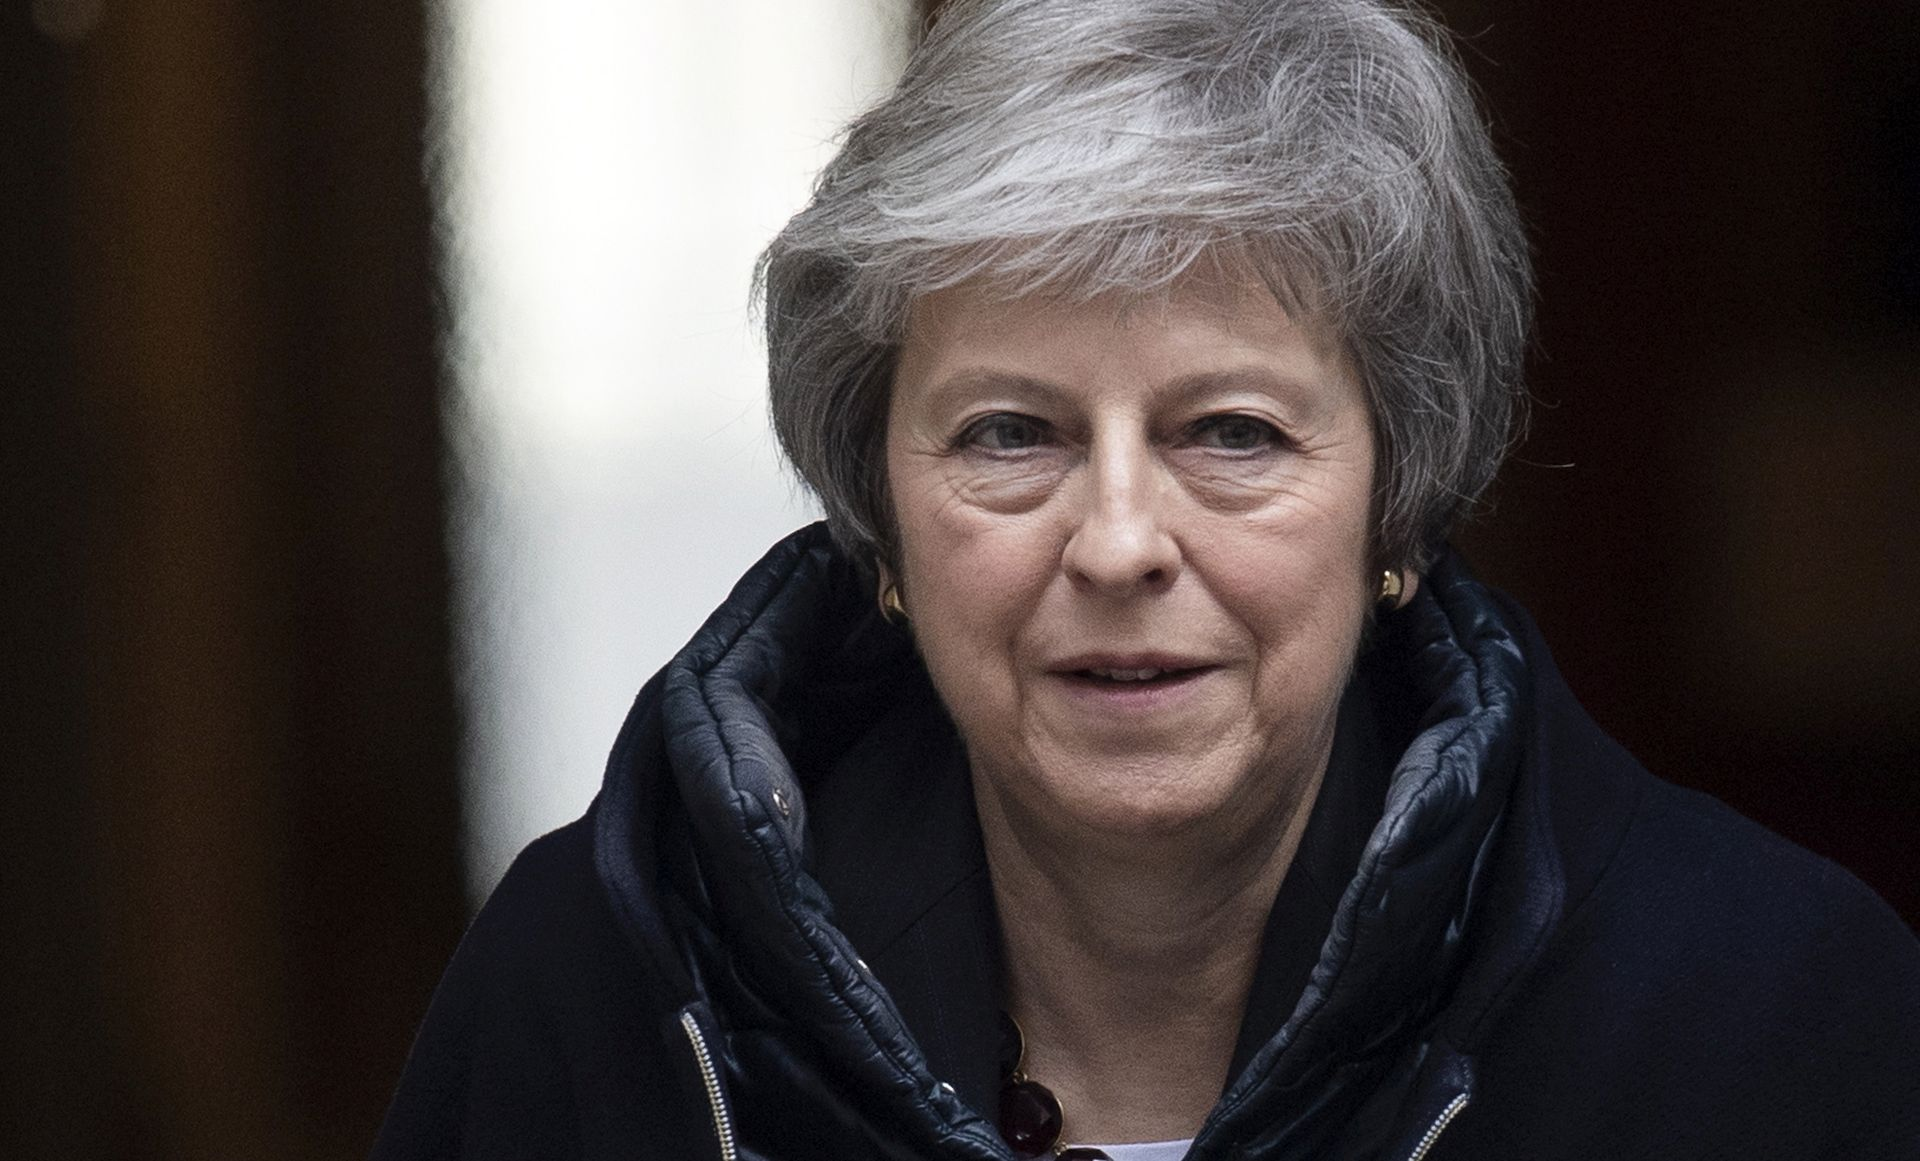 Još jedan saveznik napustio Theresu May zbog Brexita